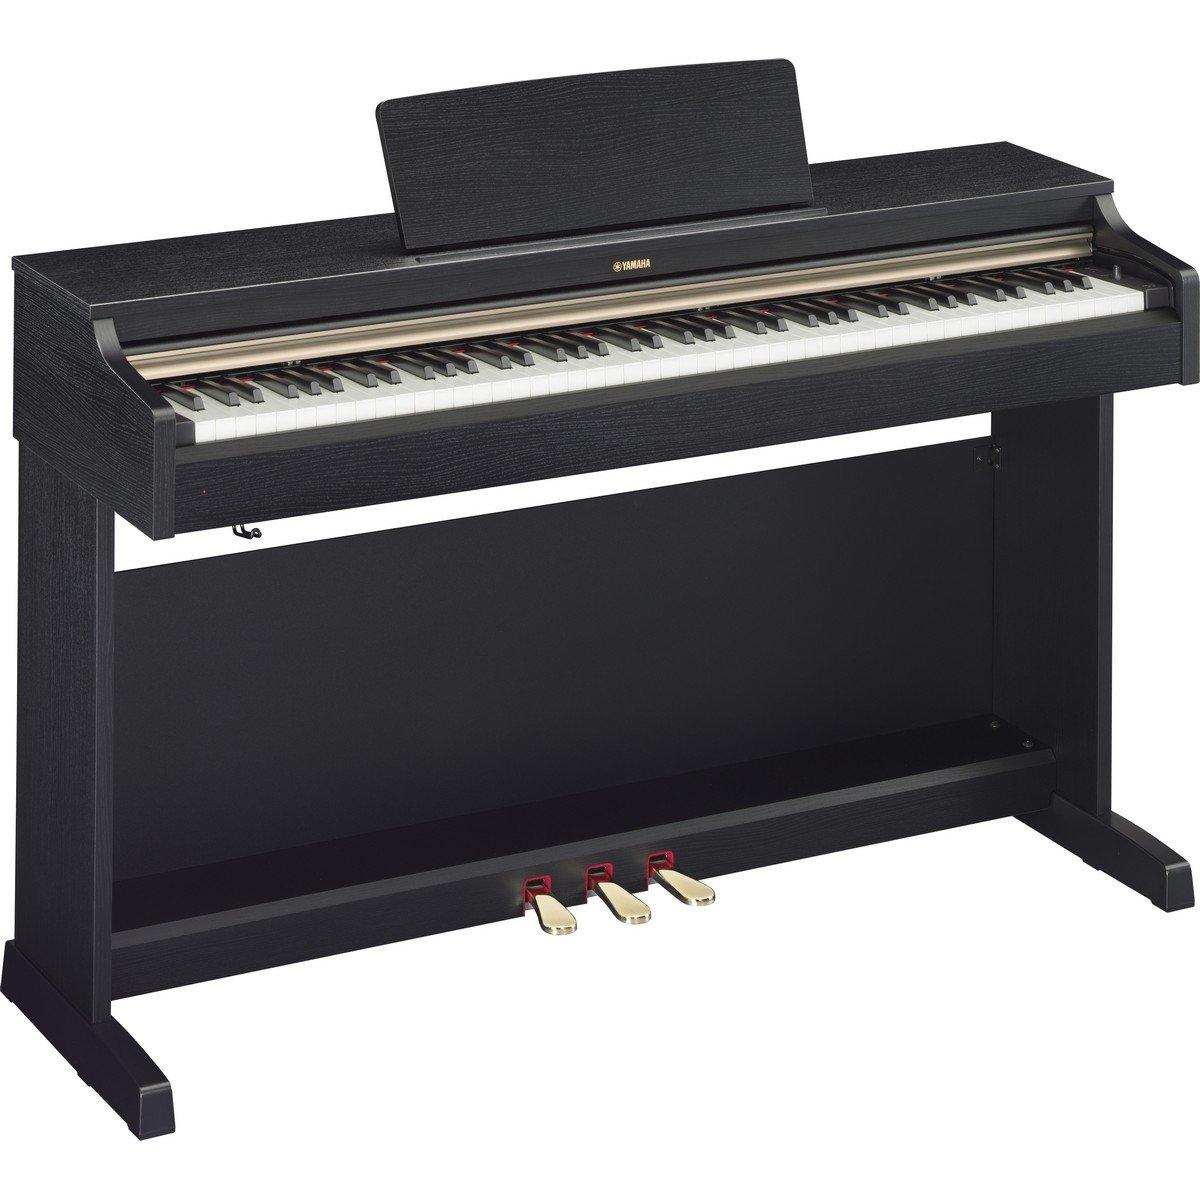 Yamaha Arius YDP162B Traditional Console Digital Piano with Bench, Black Walnut by YAMAHA